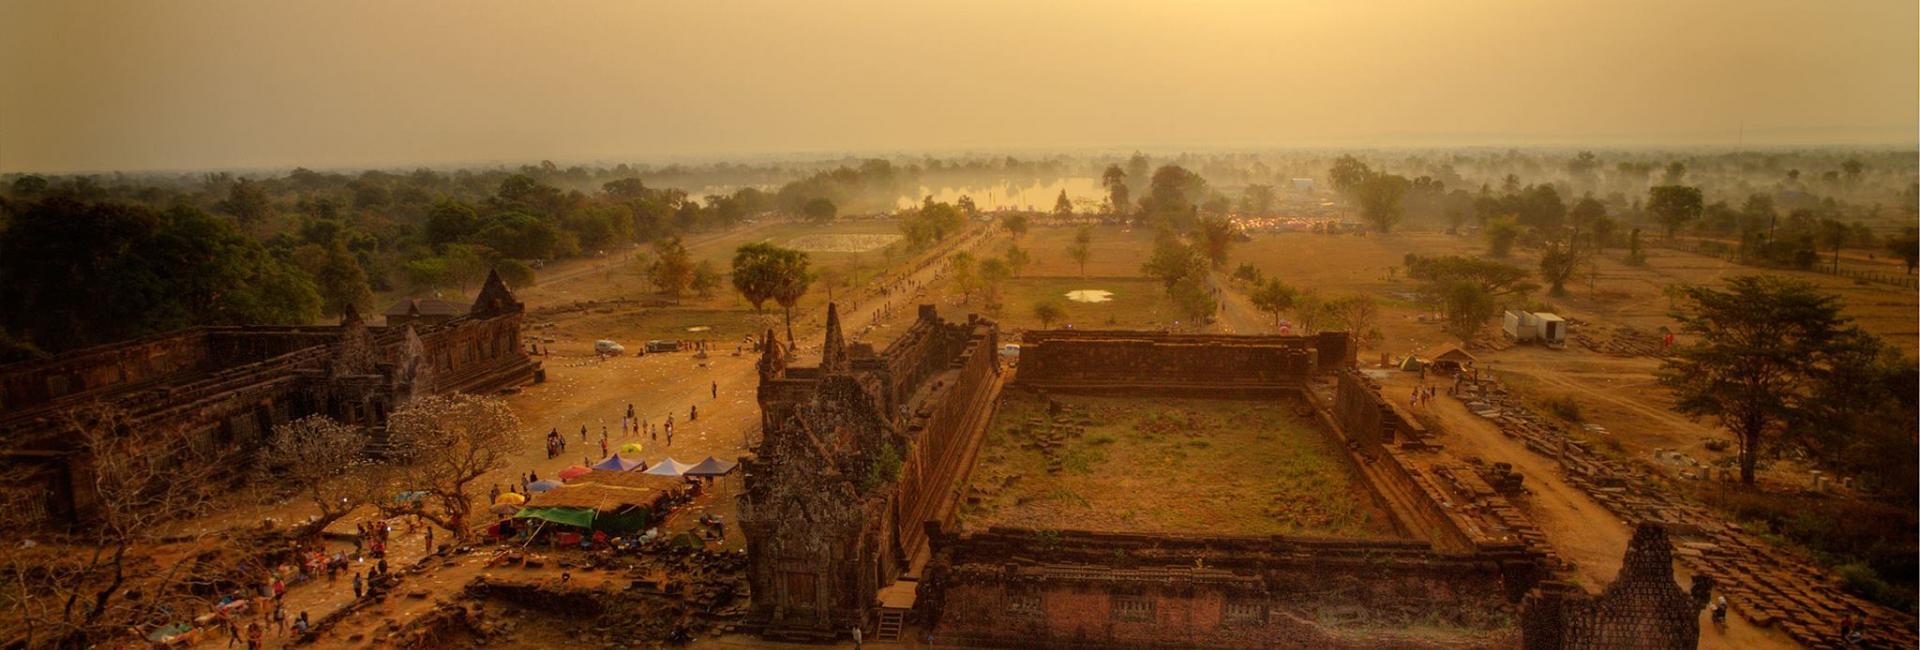 History Comes Alive in Laos